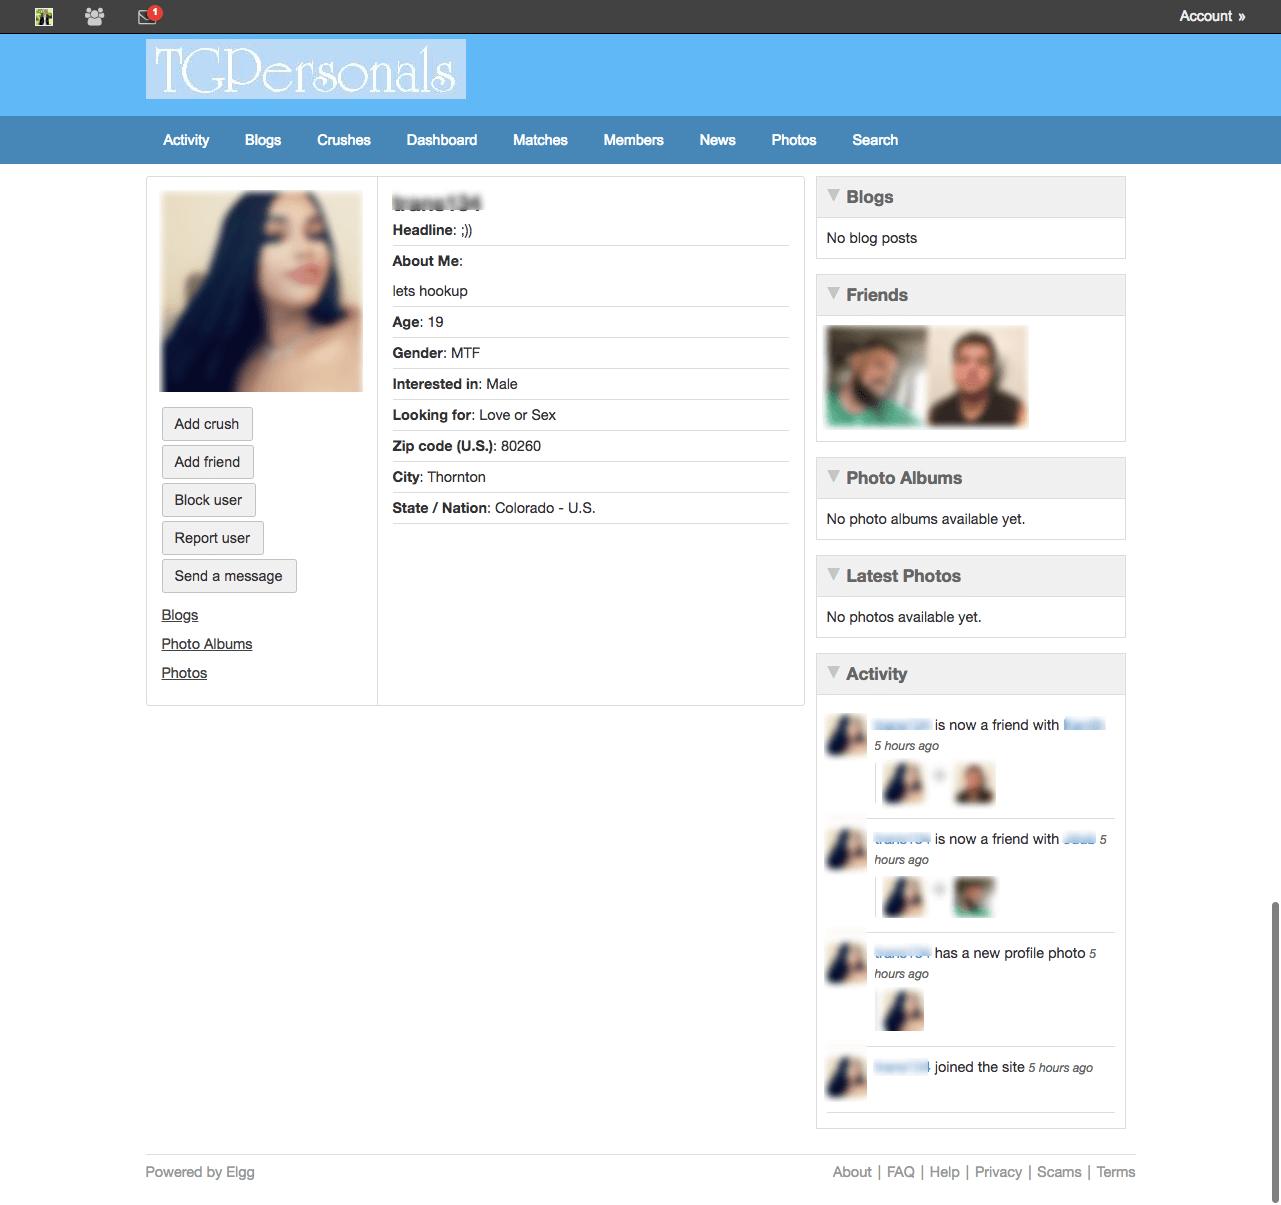 TGPersonals profile